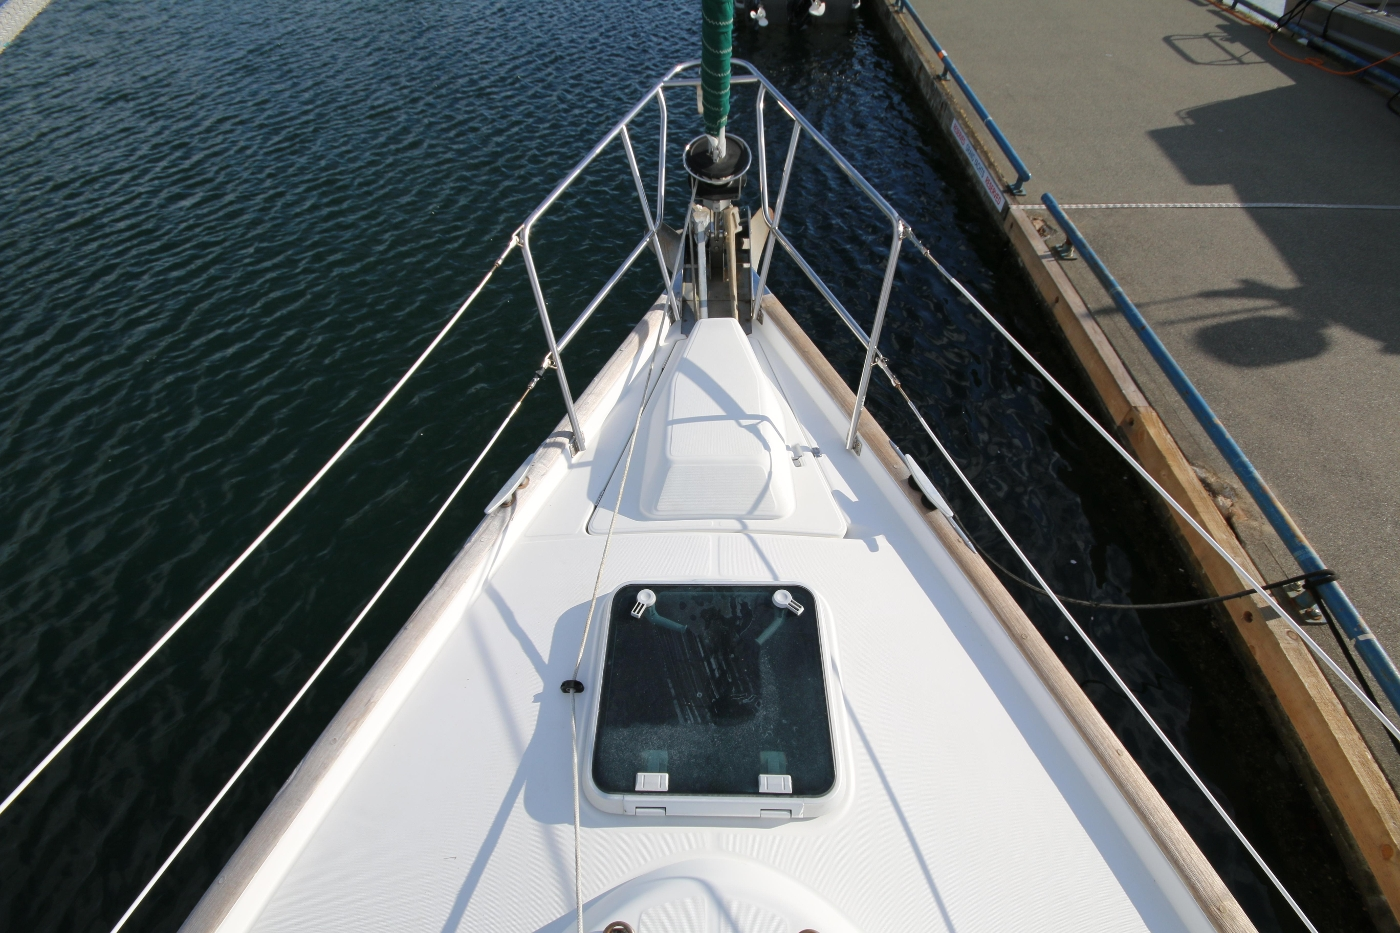 1997 Beneteau Oceanis 461, Anchor & Bow locker